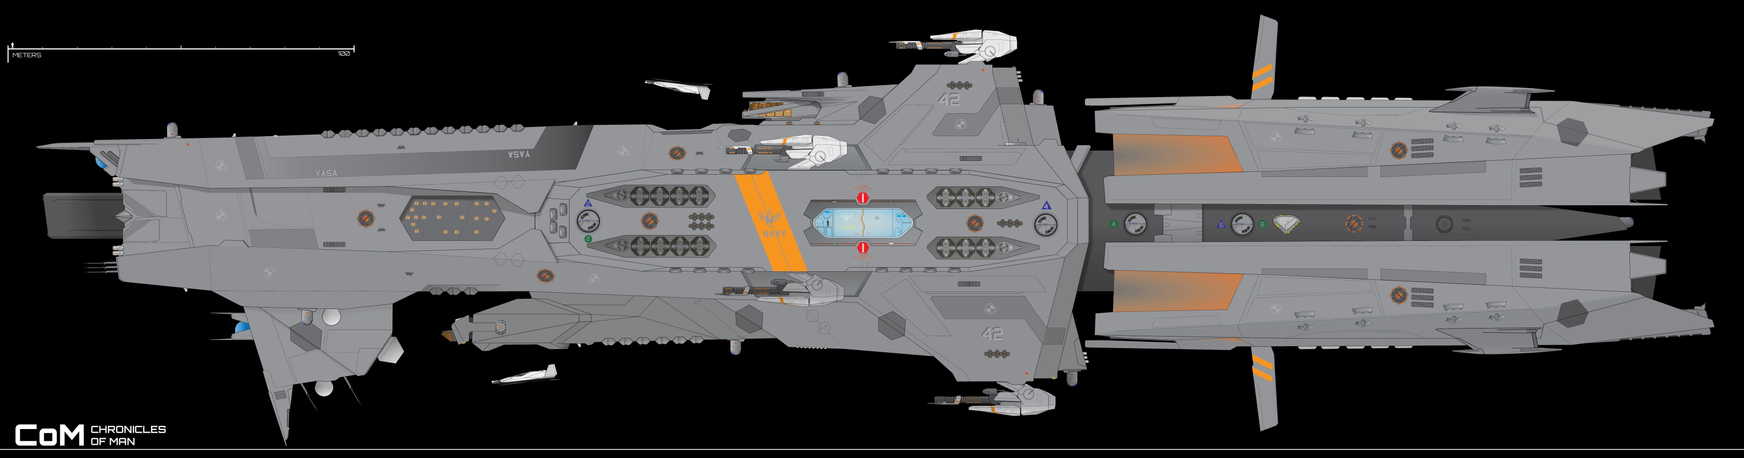 Lodestar-class Destroyer, TNV Yasa Redo by Afterskies